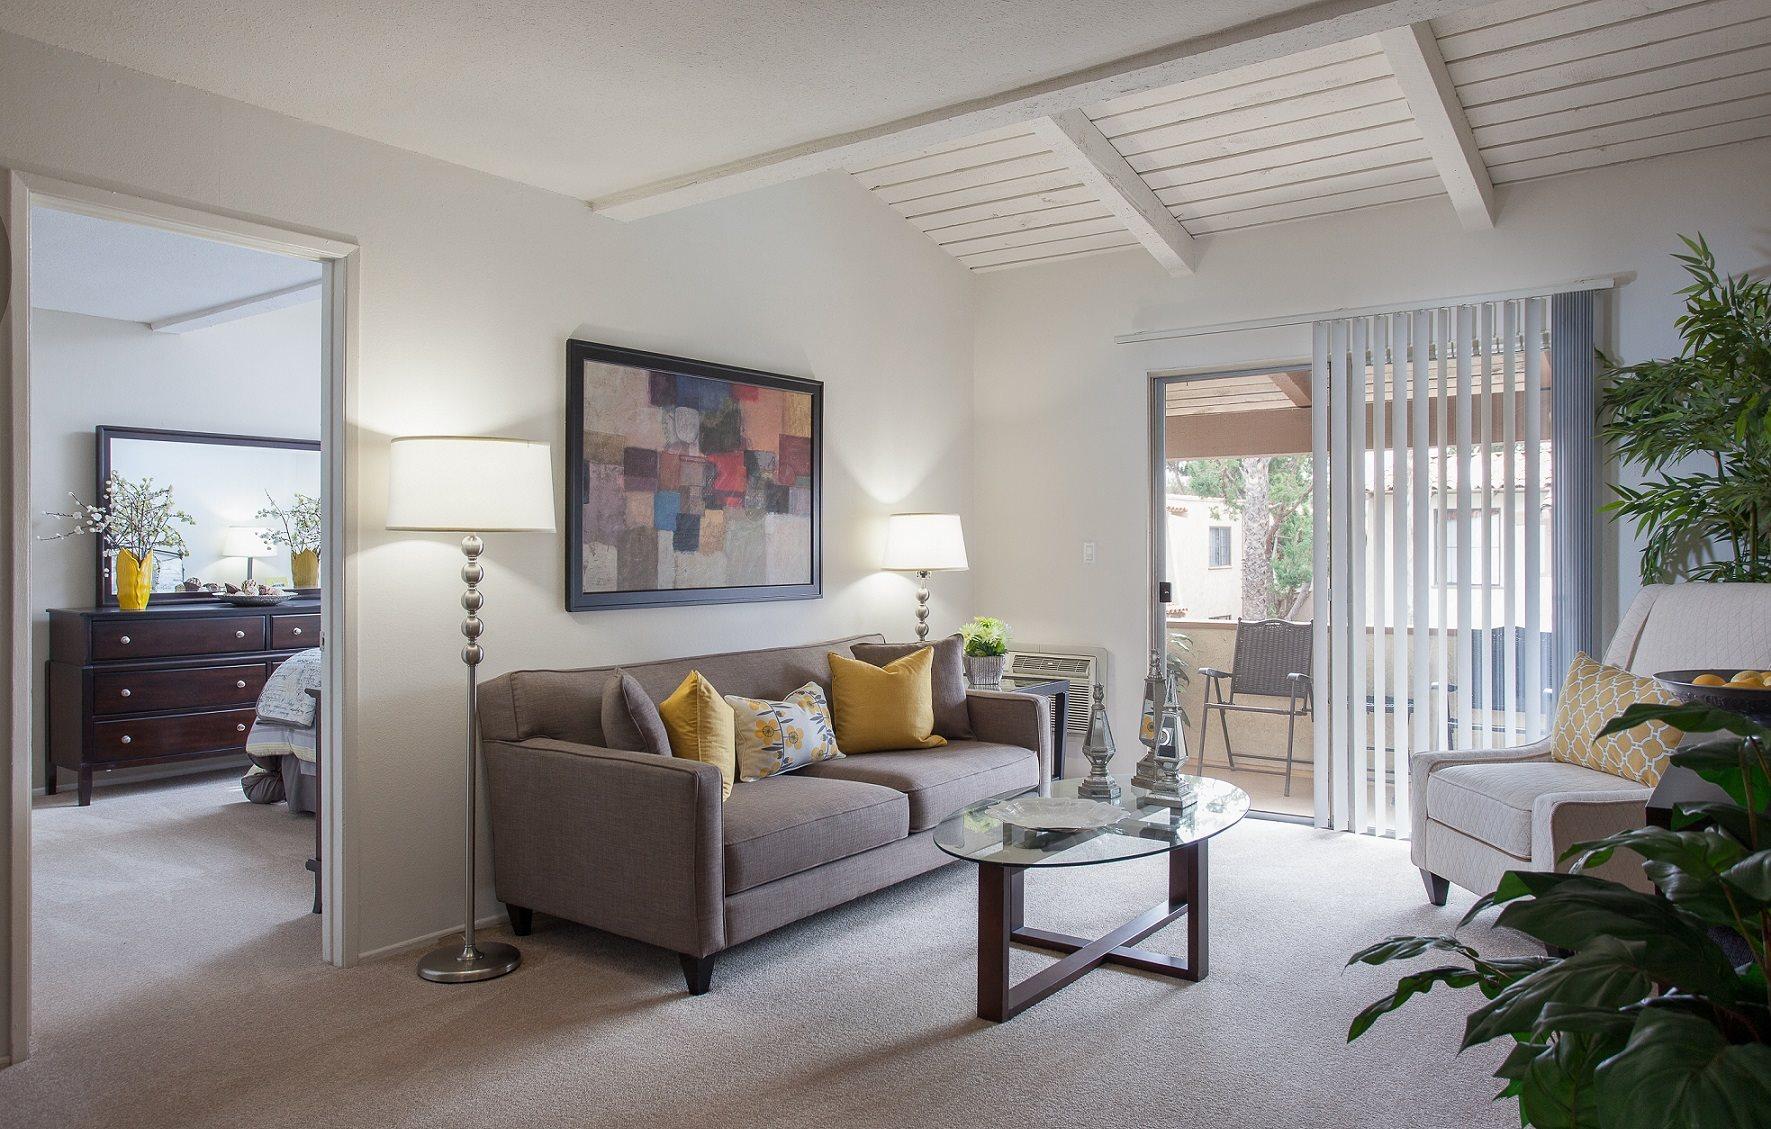 Villa viento apartments in tustin ca for 3 bedroom apartments in tustin ca